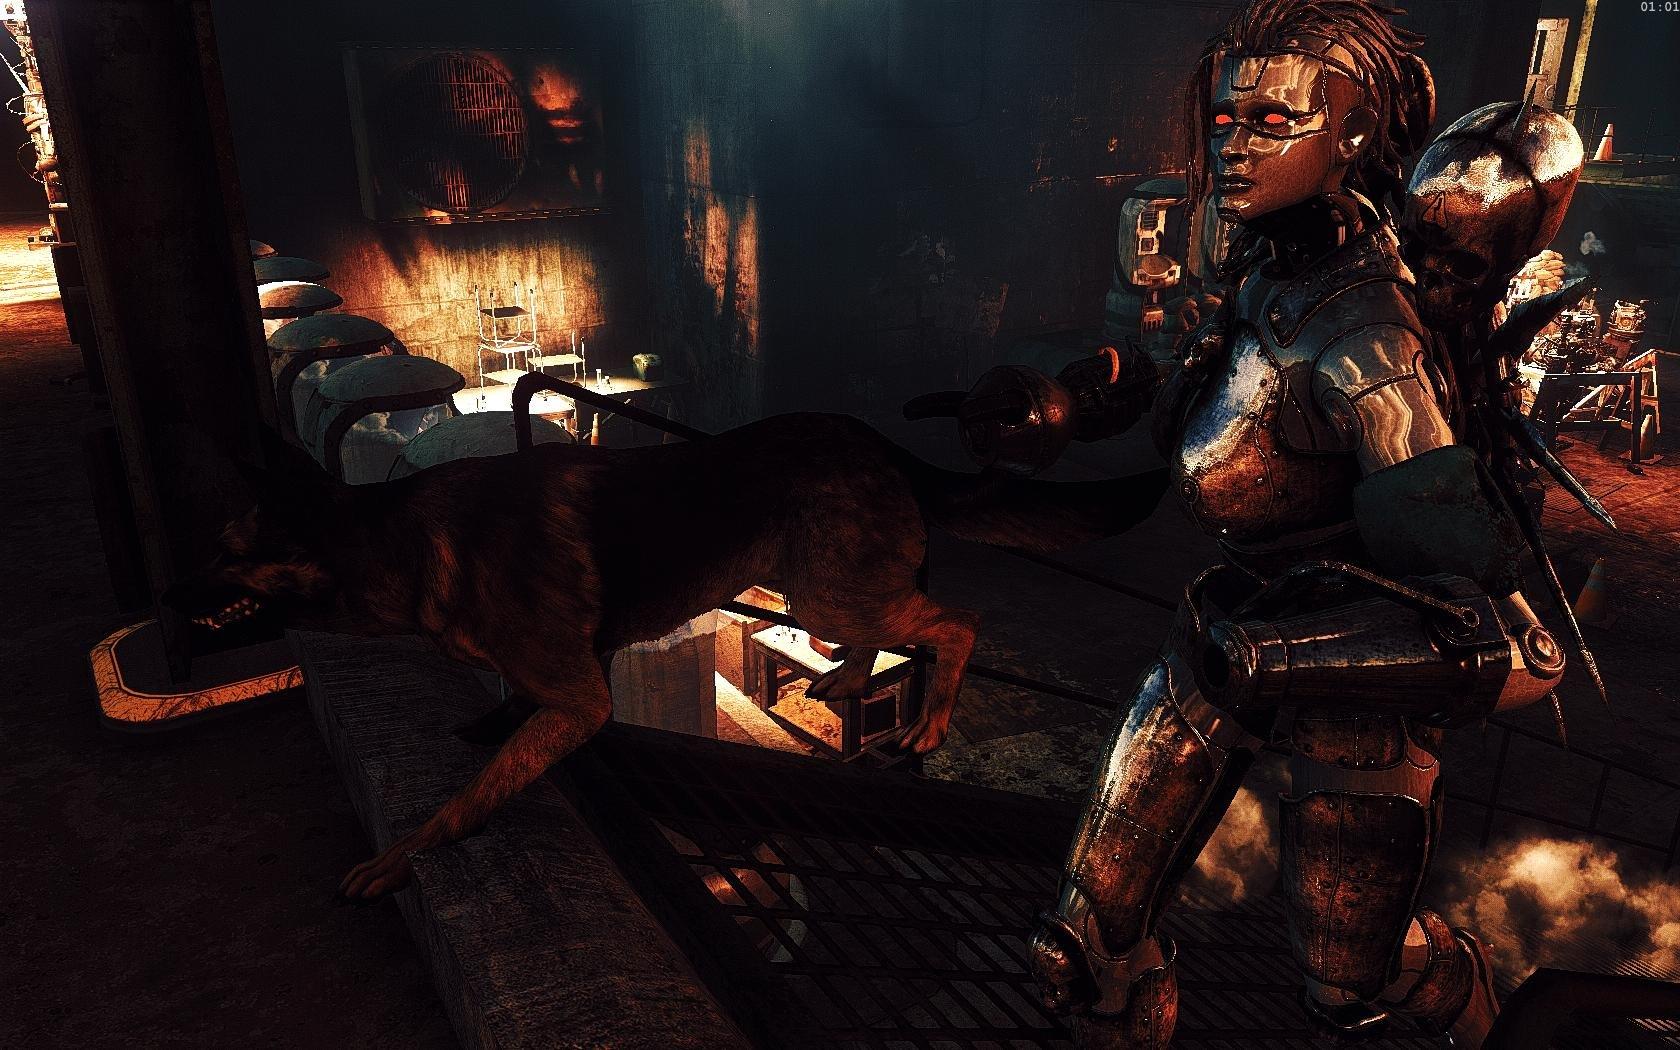 Fallout4 2019-03-08 01-01-52-95